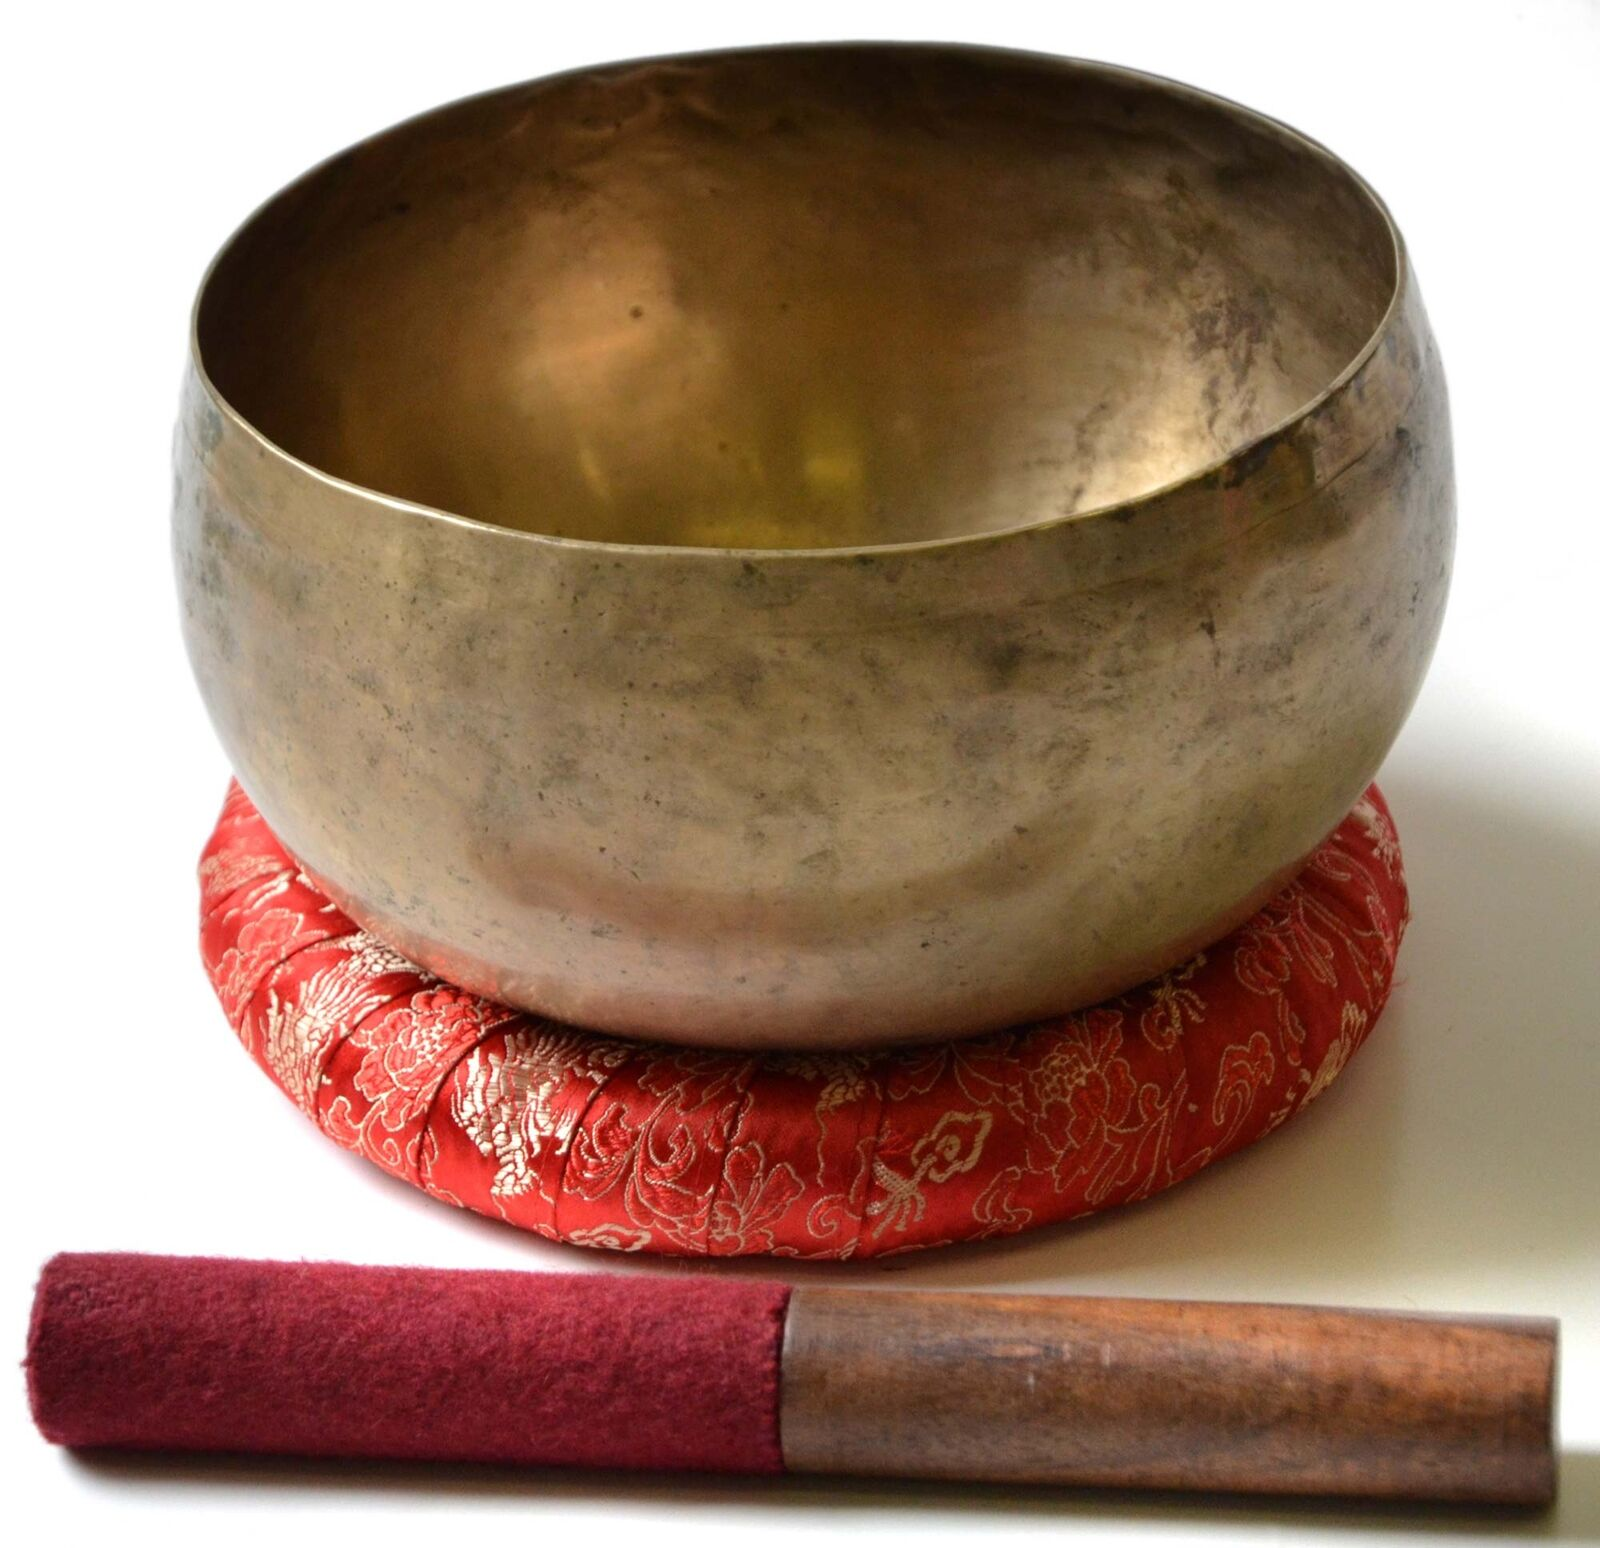 Tibetische Klangschale Typ Khopre 600 - 700 g mit Ringkissen & ReiBesteab